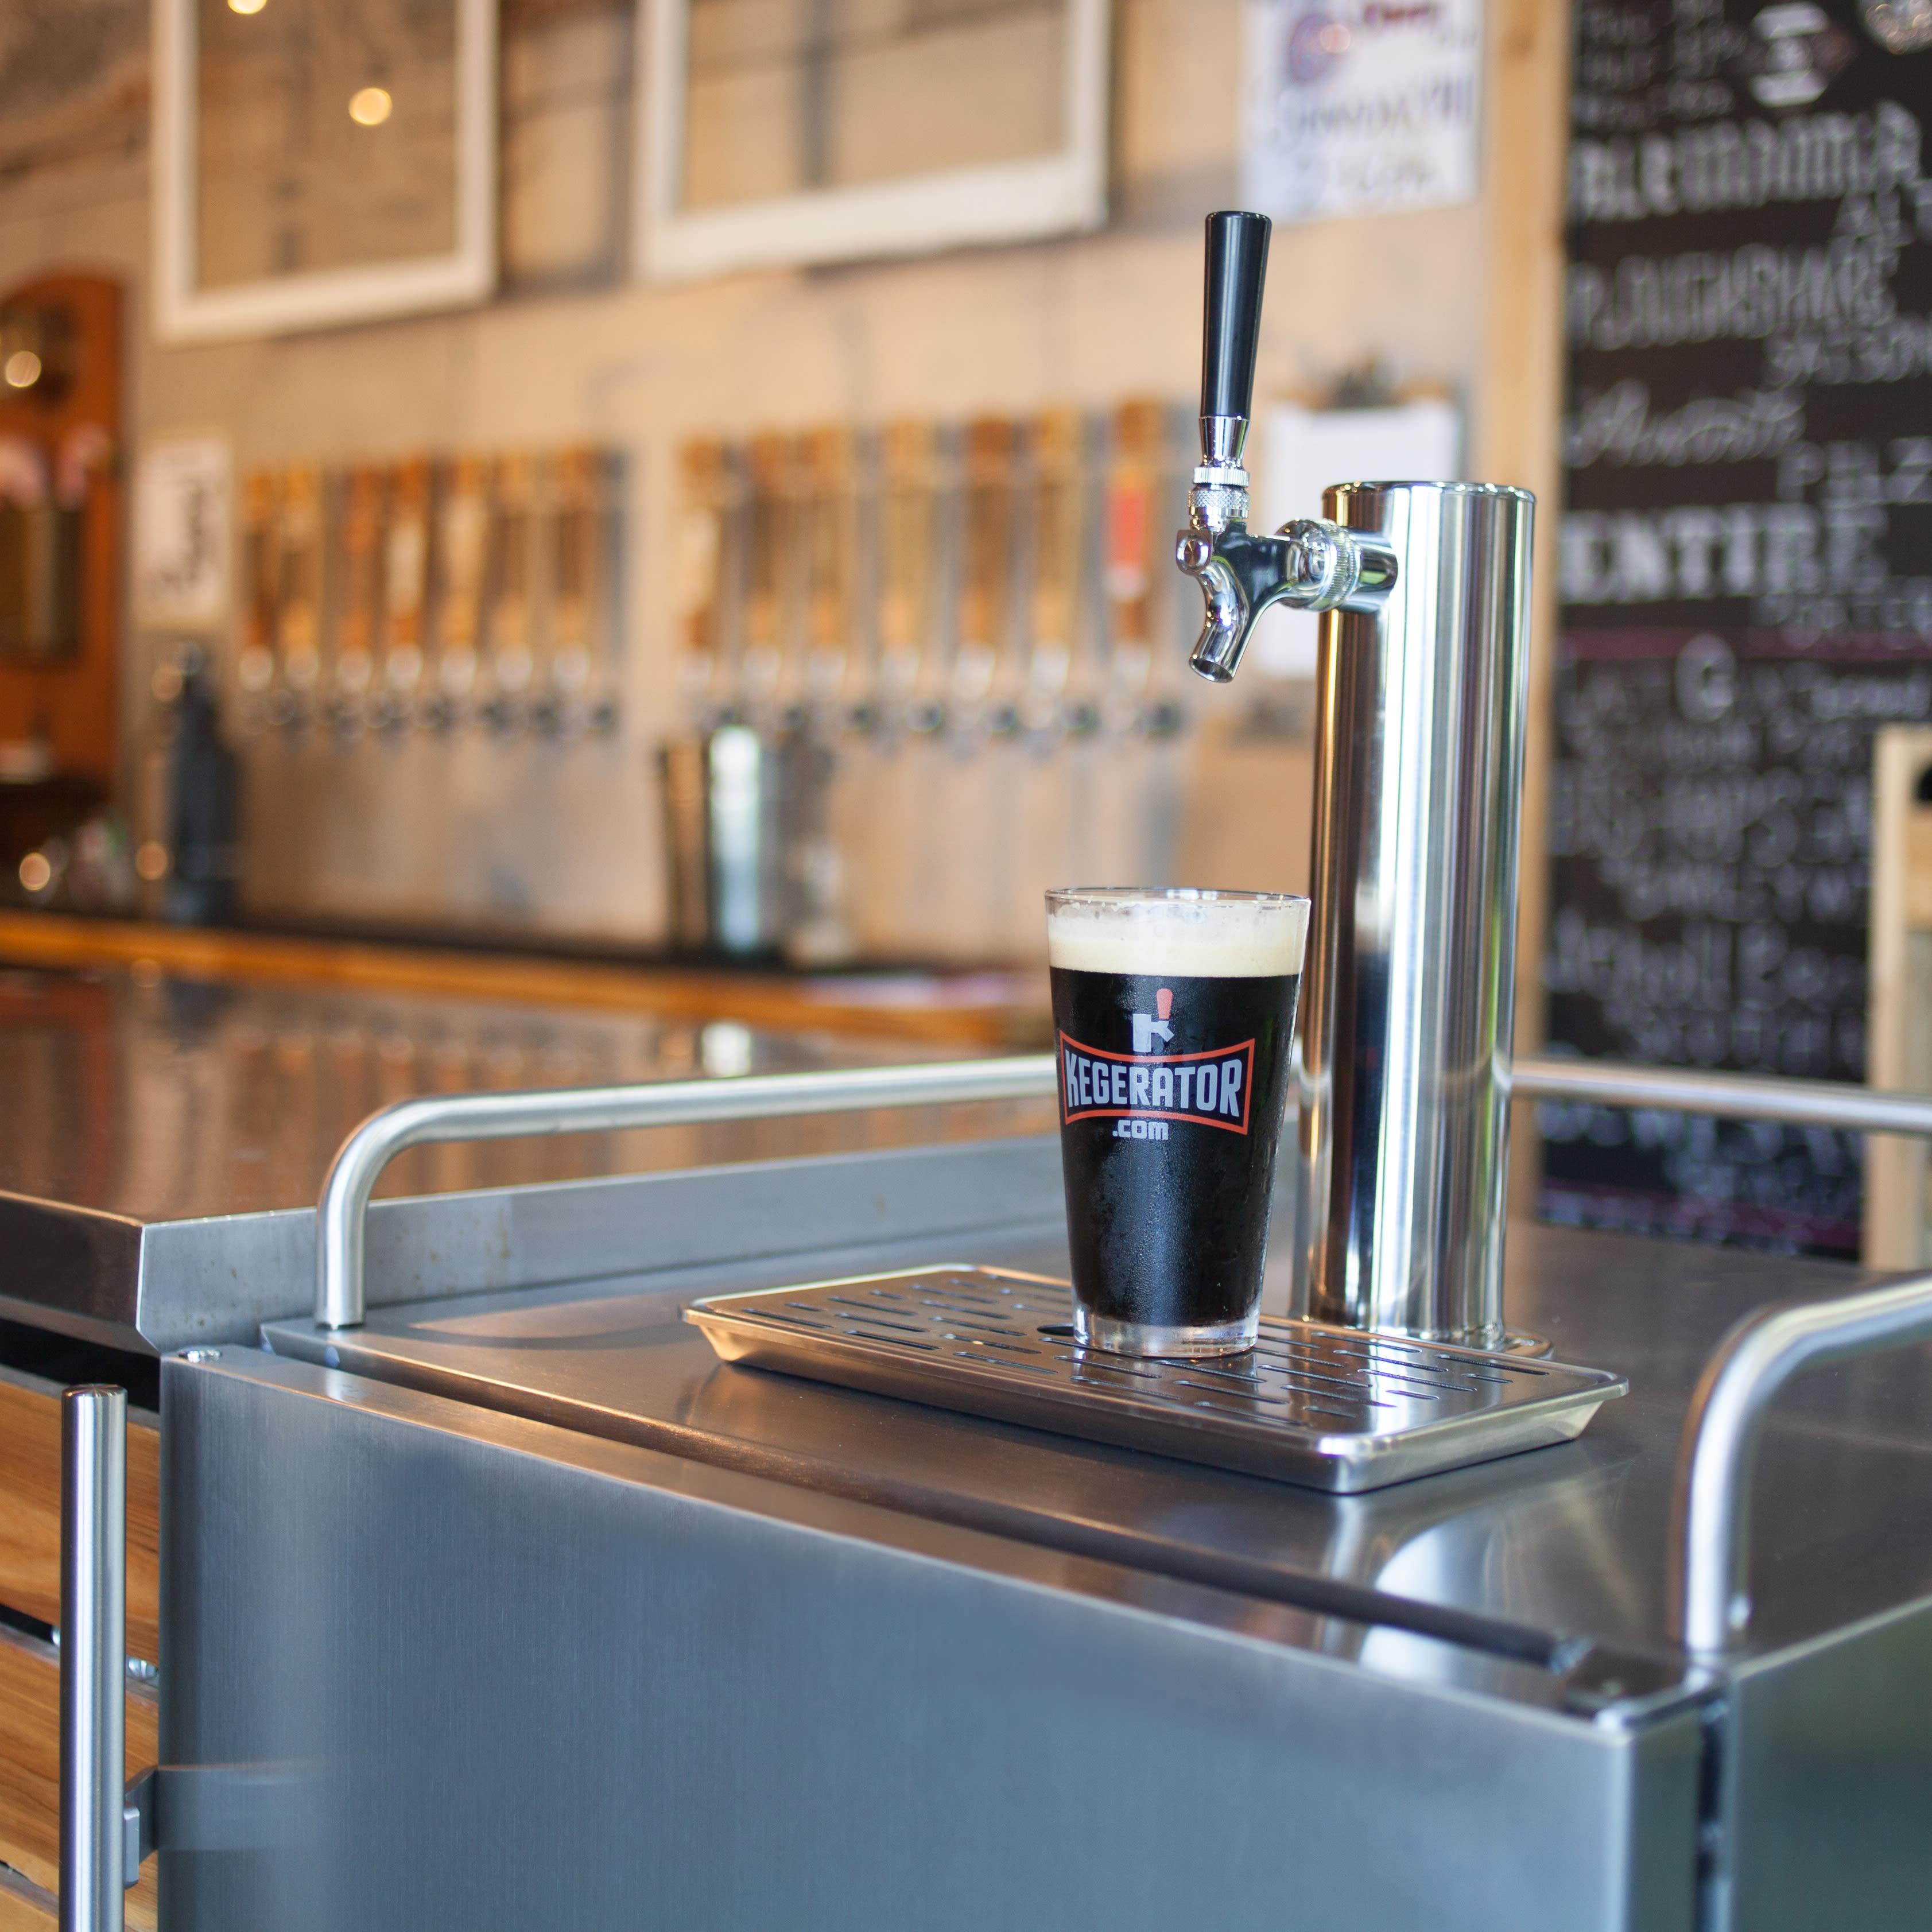 Man Cave Beer Bar : Kegerators beer coolers kegs dispensers kegerator